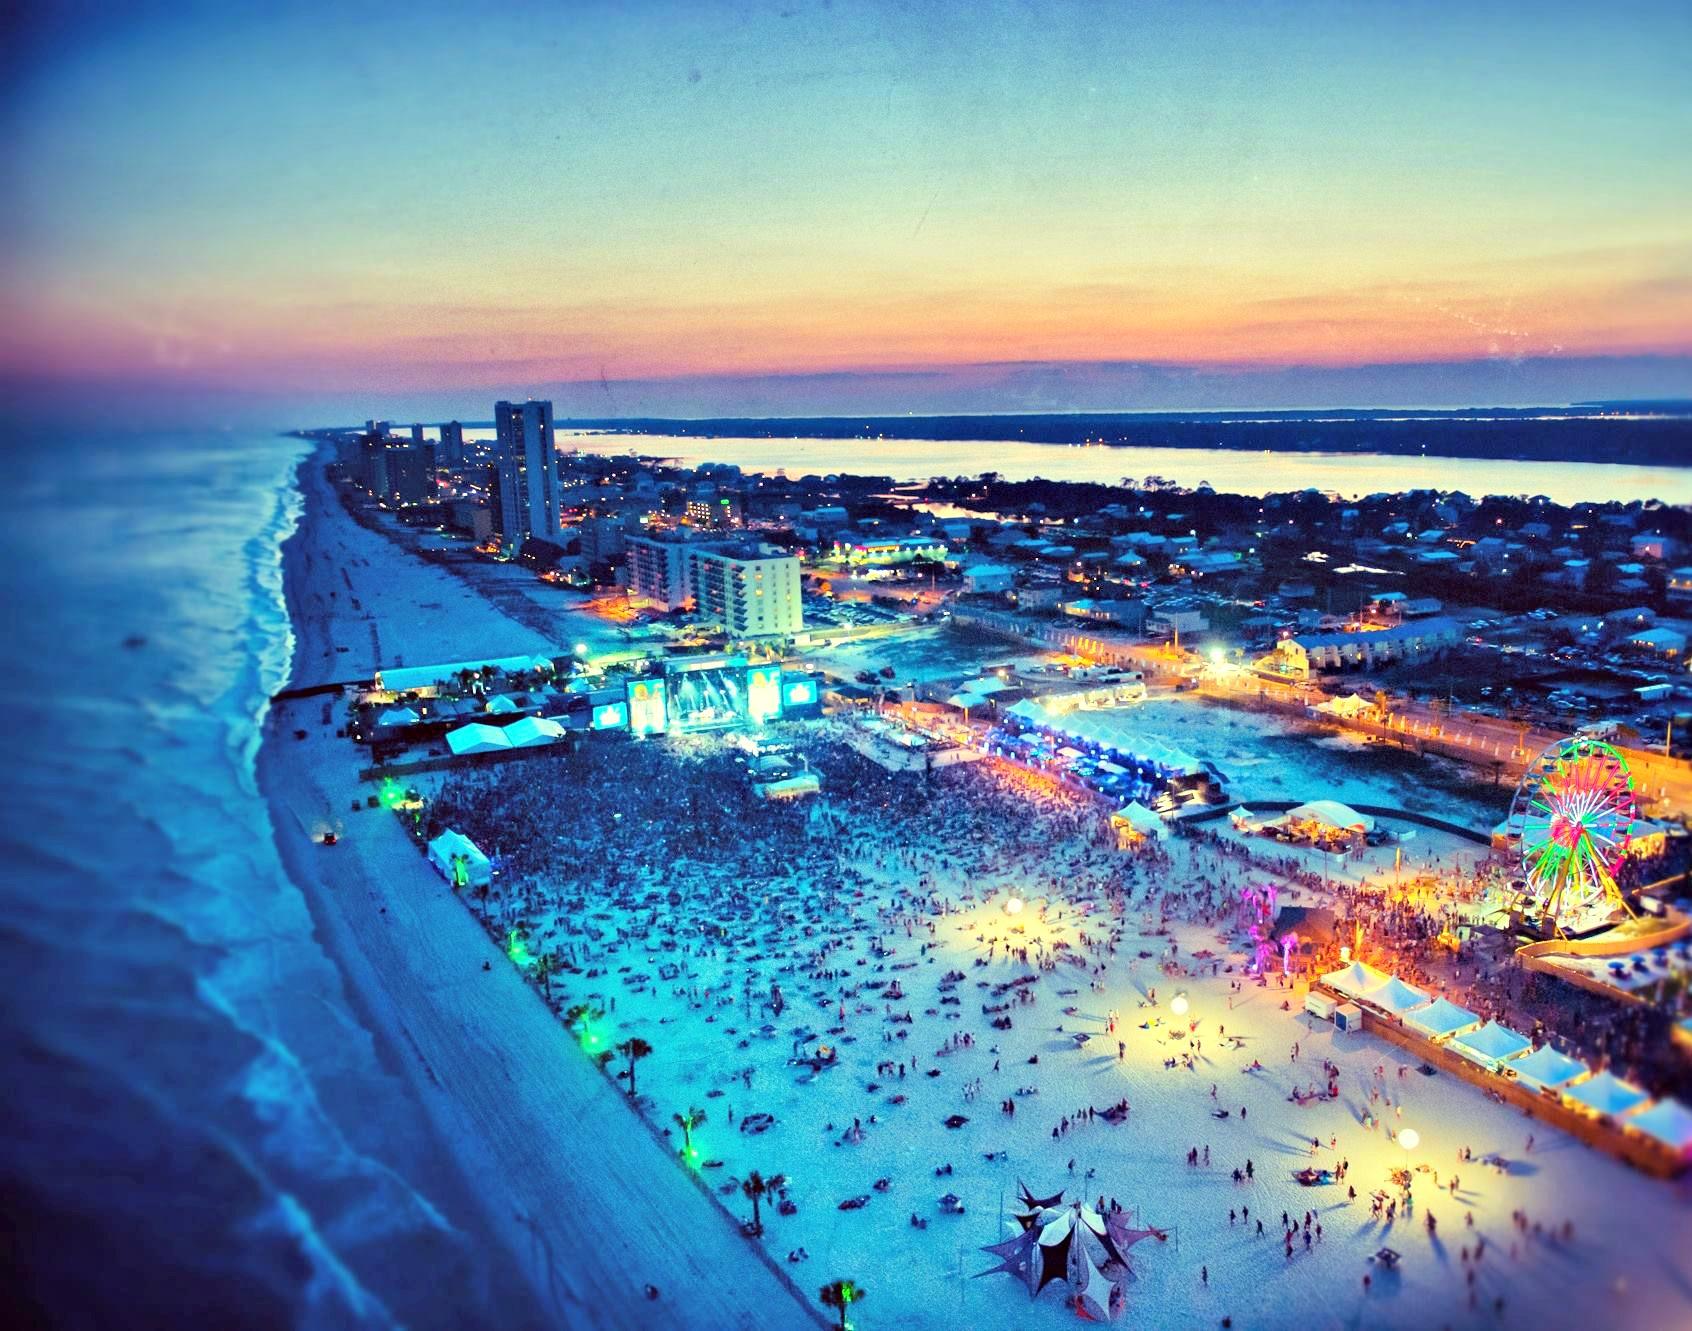 Hangout Music Festival on the beach in Gulf Shores AL